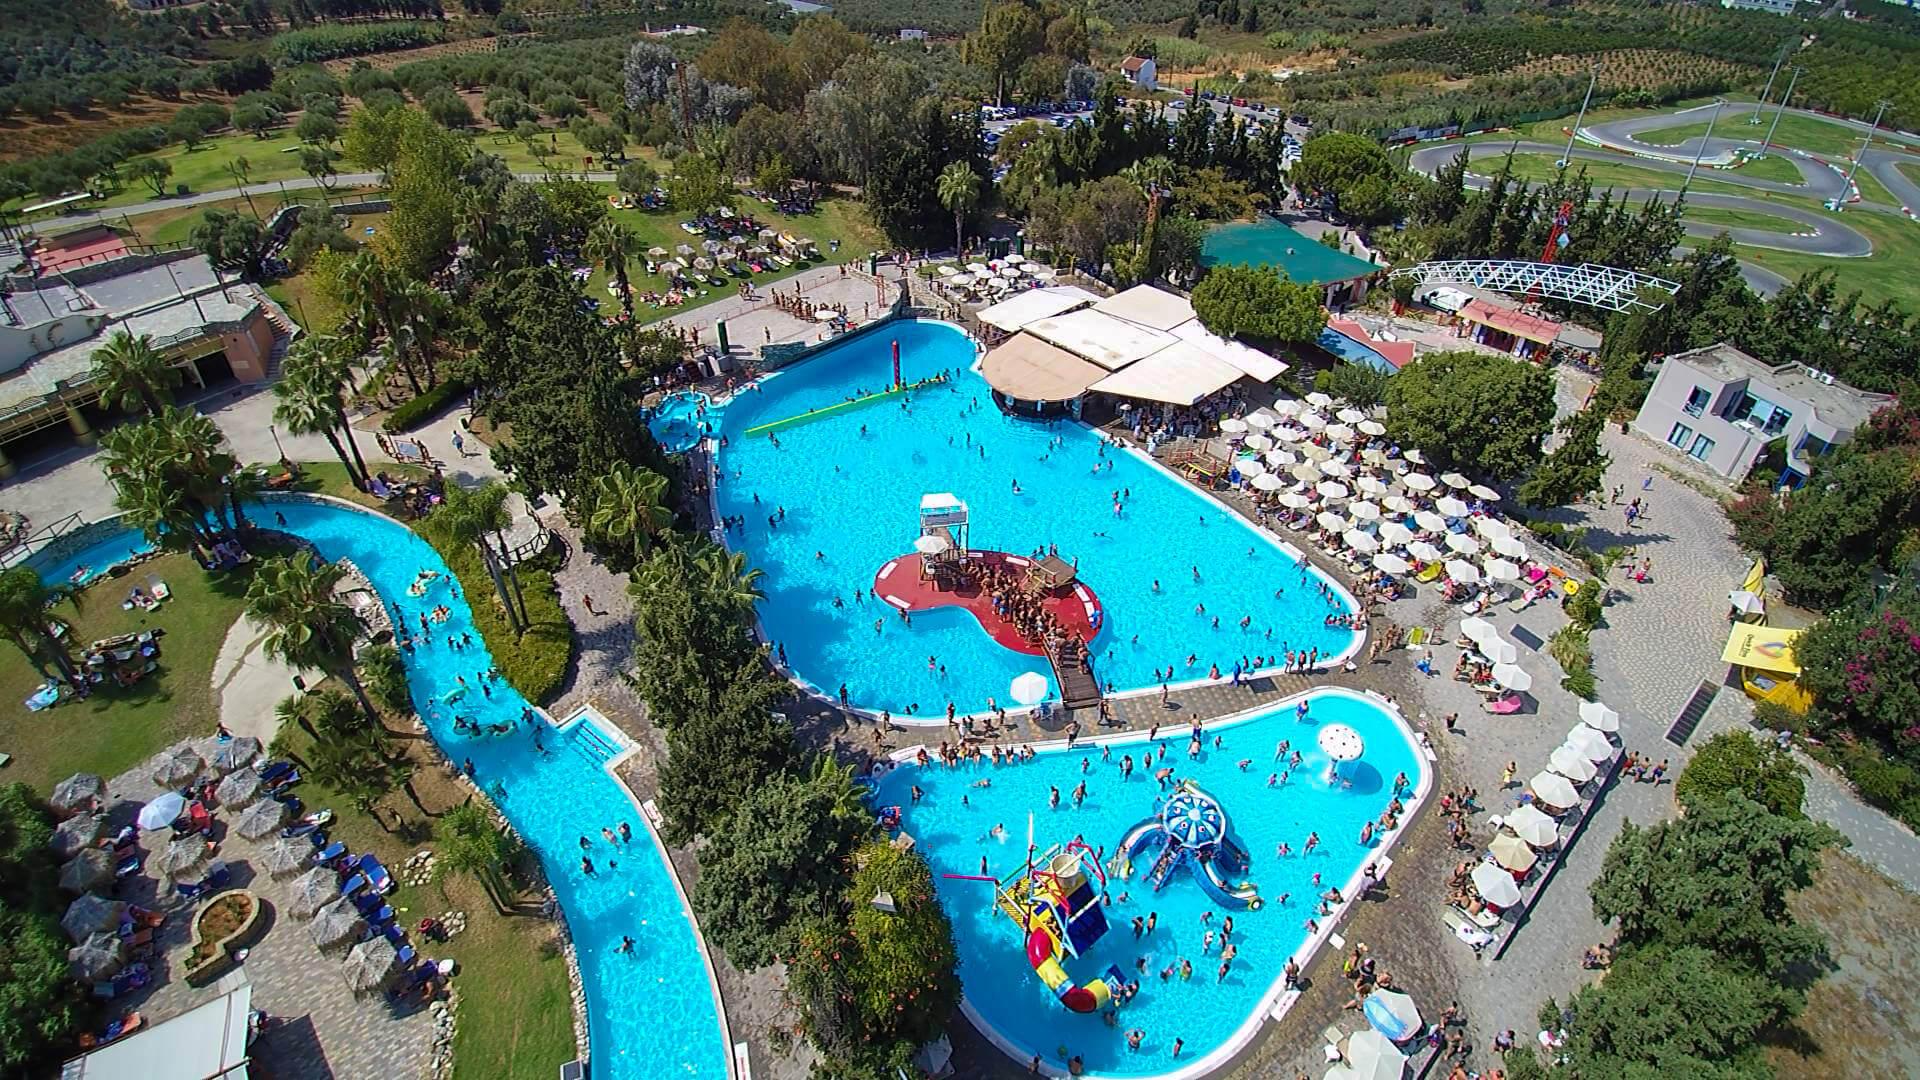 Aqua Creta Limnoupolis Chania Crete Pool